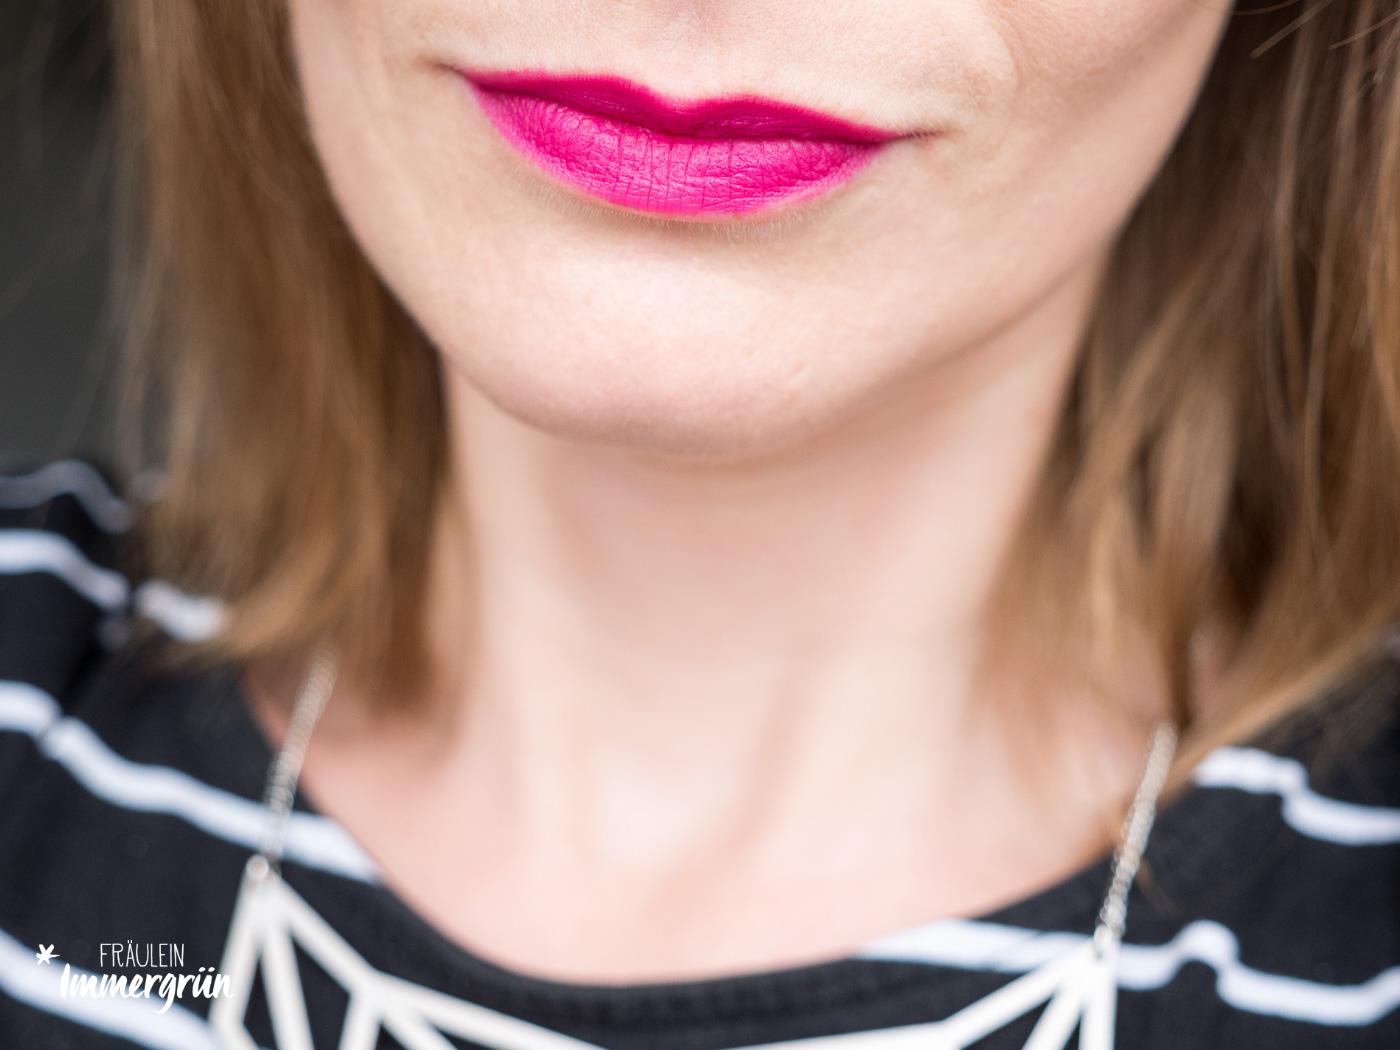 100 Percent Pure natuerlicher Lippenstift: Tragefoto von Cocoa Butter Semi-Matte Lipstick Marrakesh. Vegane Naturkosmetik.